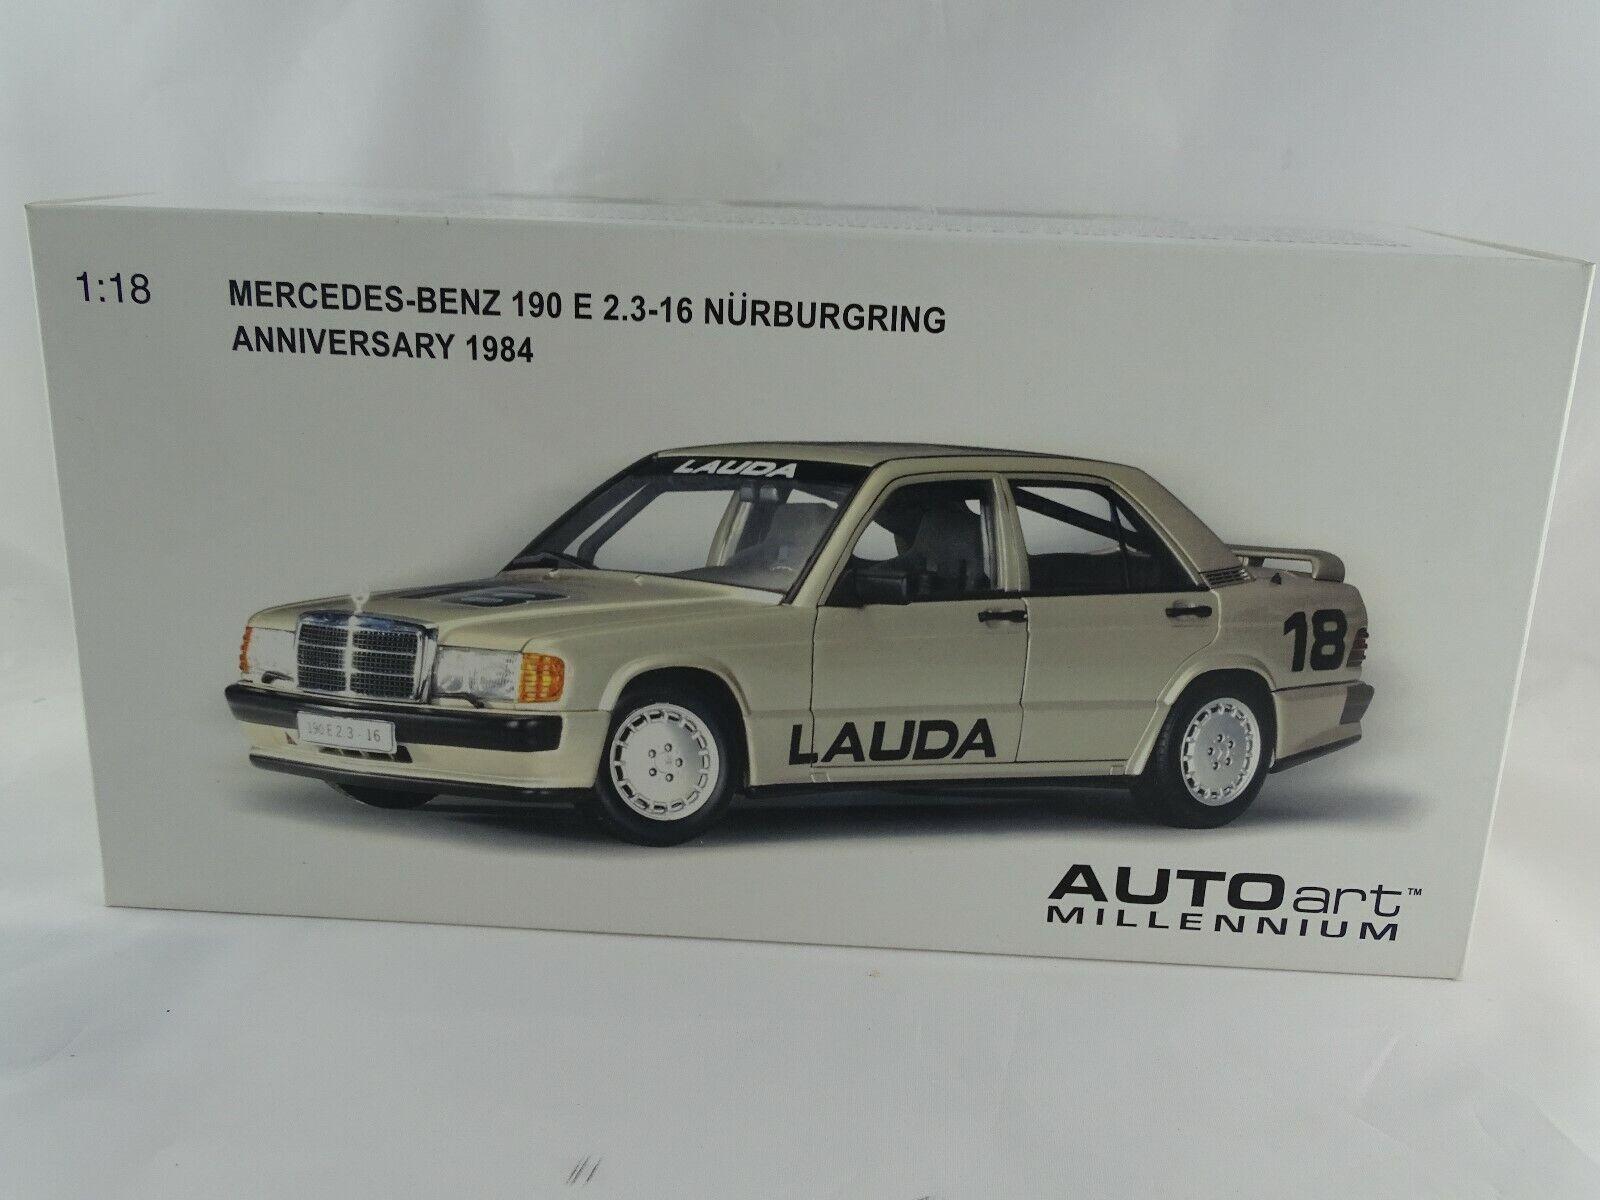 protezione post-vendita 1 1 1 18 Autoart 88431 Mercedes-Benz 190 e 2.3-16 NURBURGRING 1984 Lauda RAR   18  i nuovi marchi outlet online